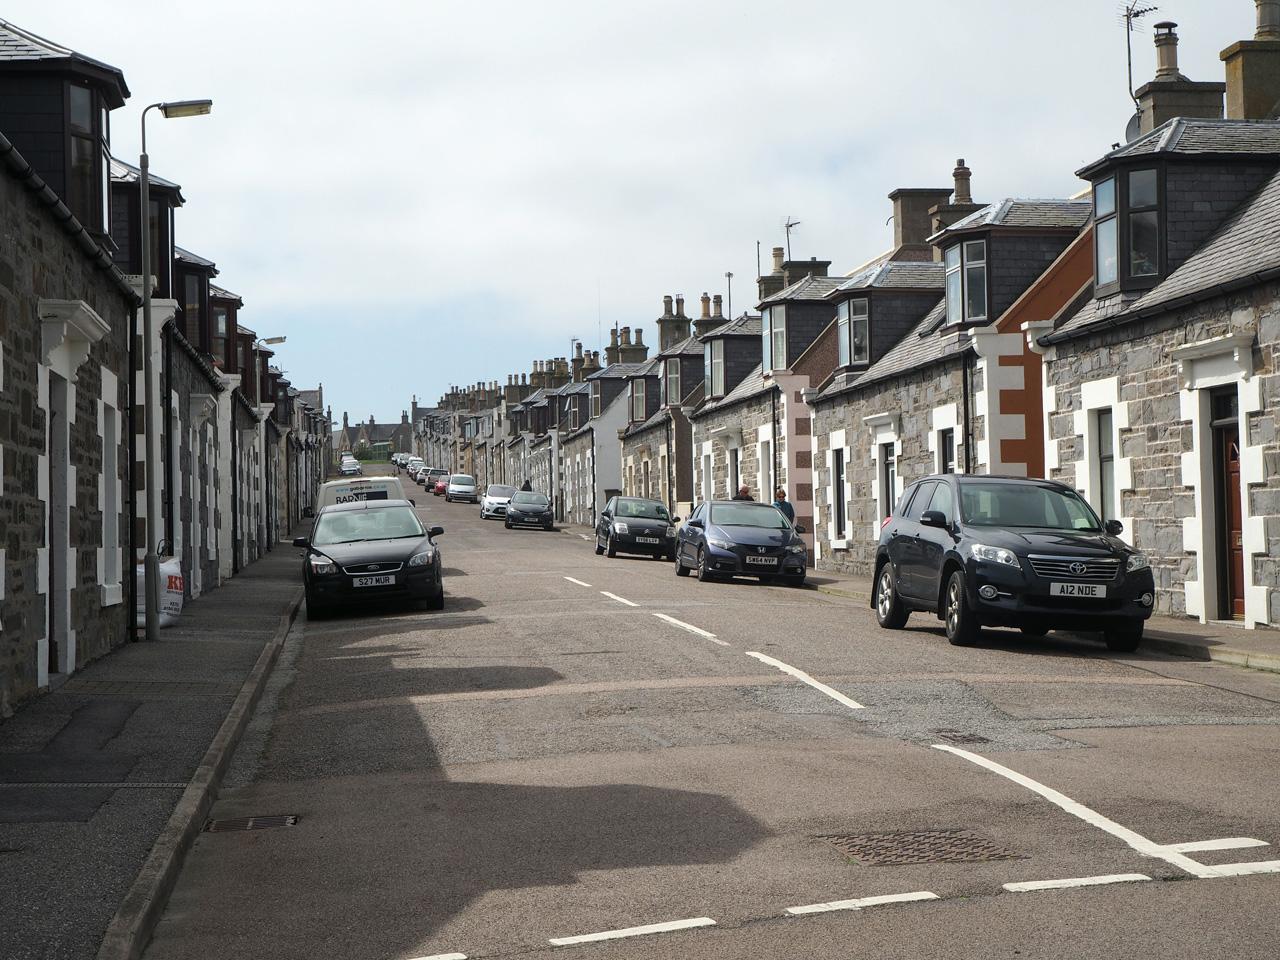 de kleine huisjes in Portknockie